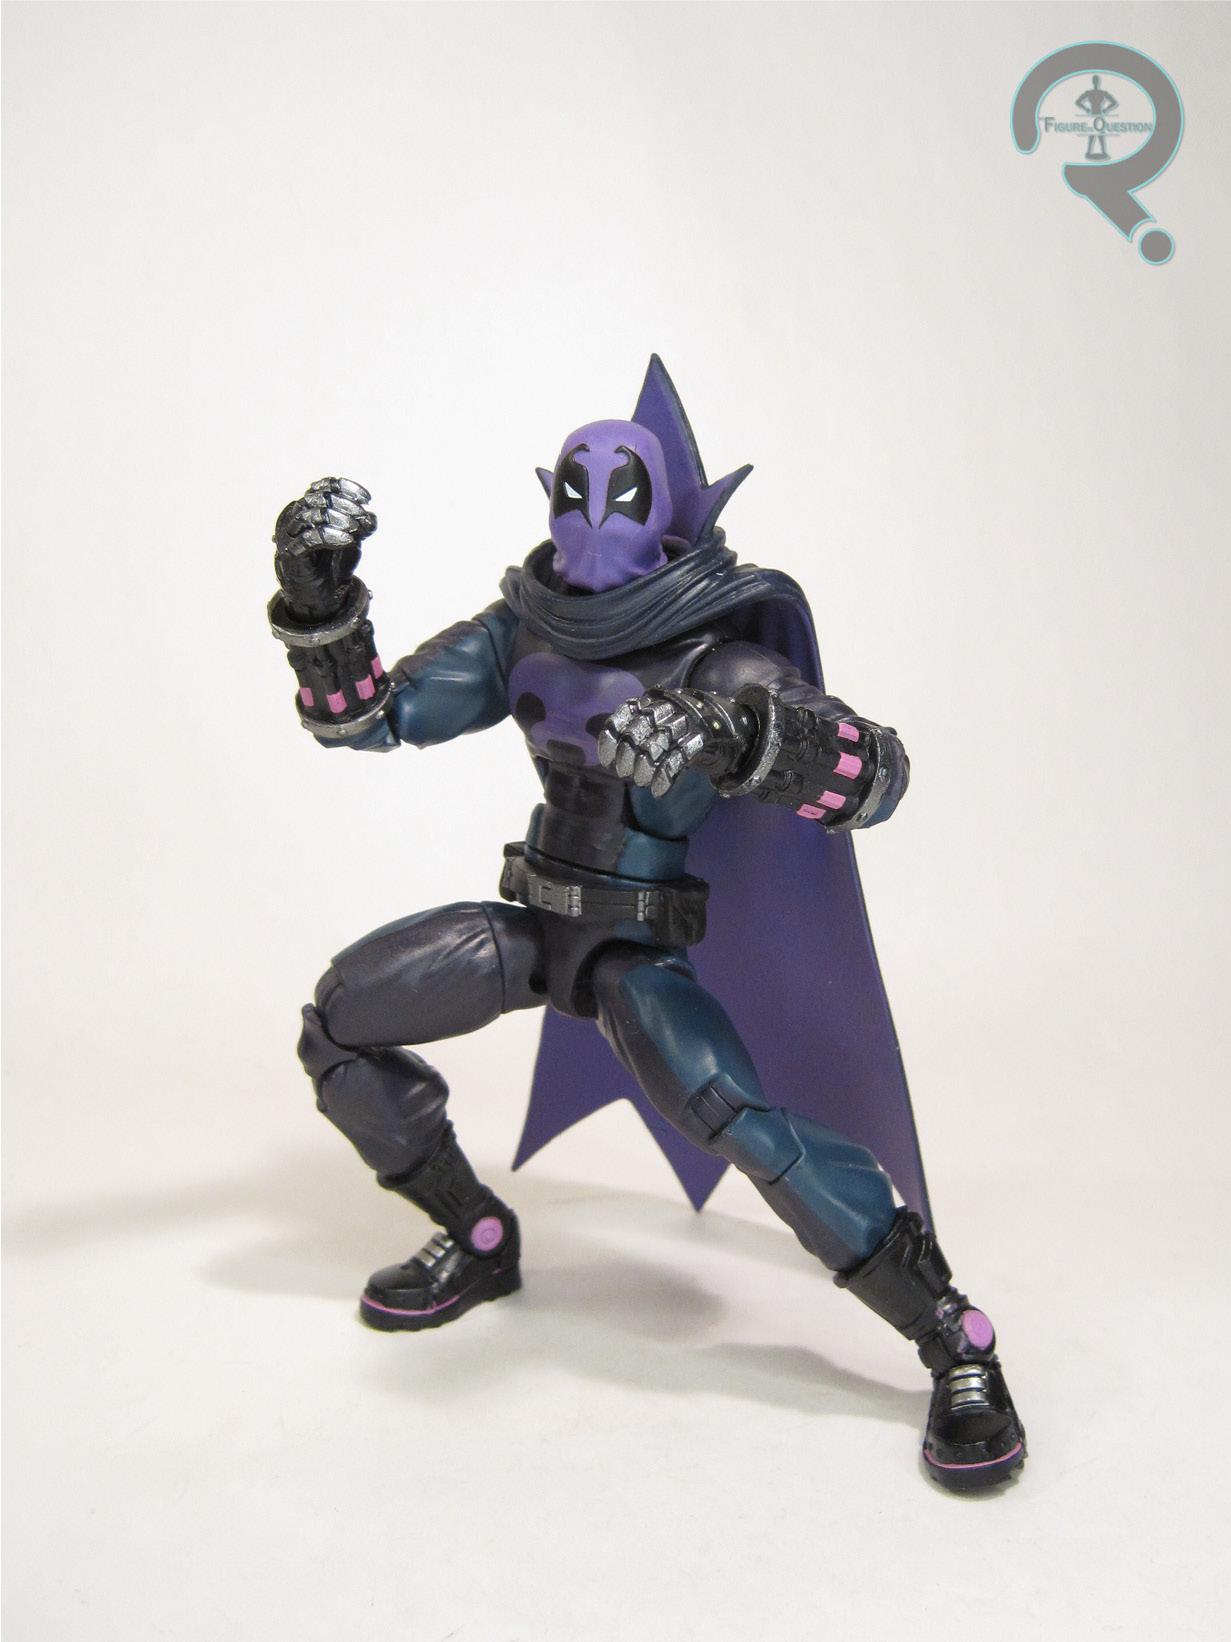 Custom Cloak Violet with hood for Marvel Legends Prowler male body NO FIGURE